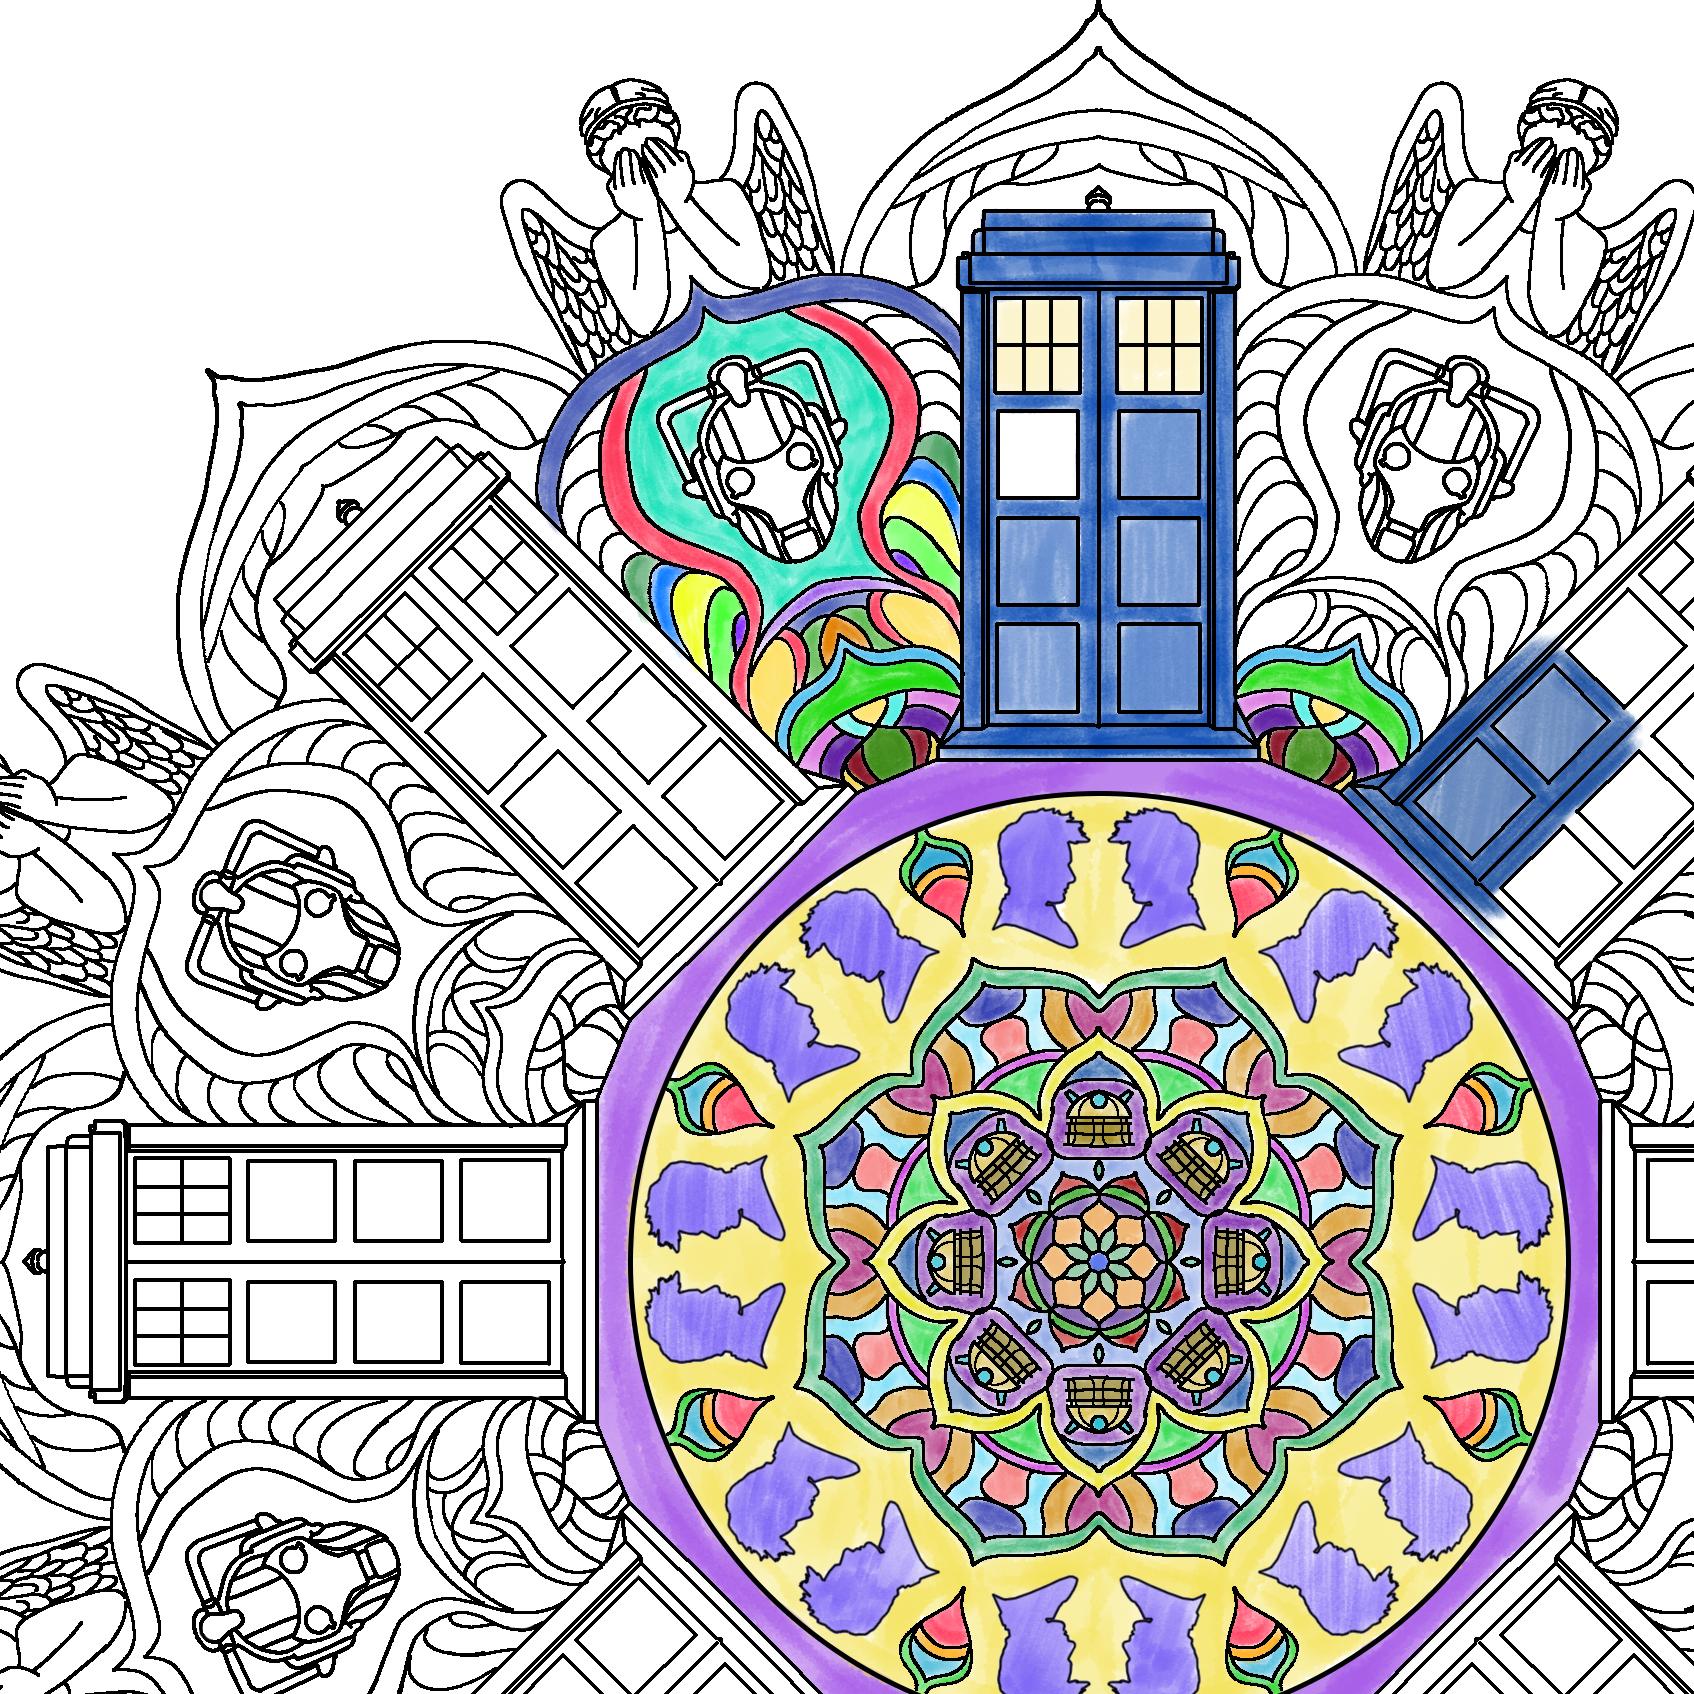 Mandala coloring book vol. 1 - download & print E-book